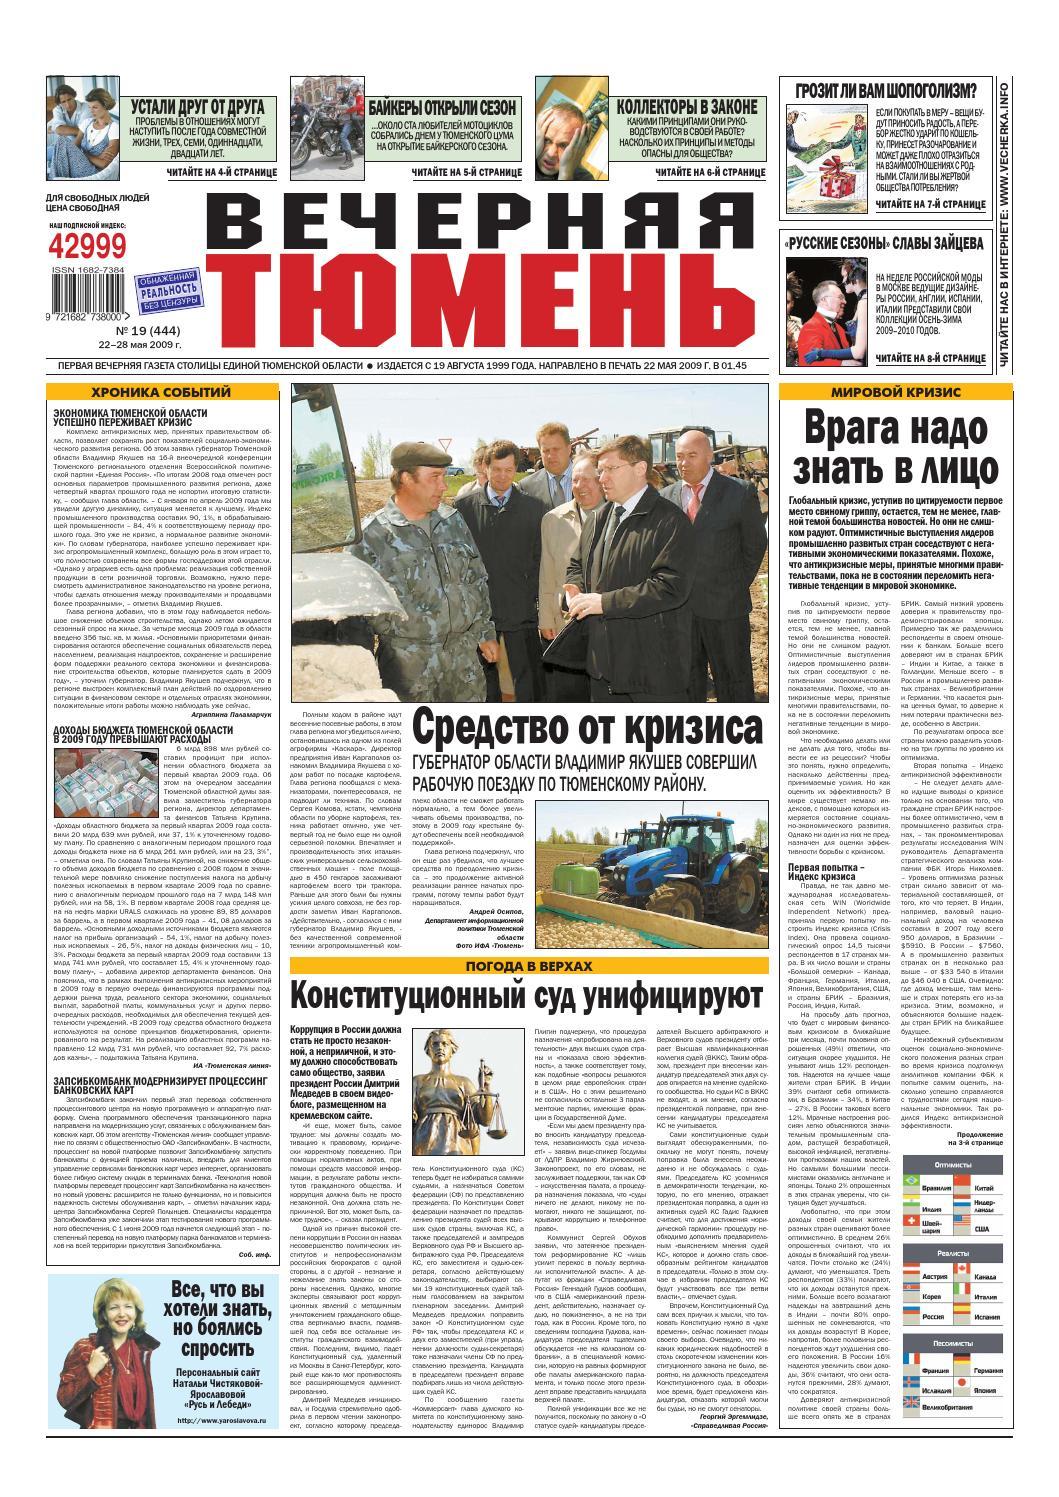 97143dcd341e Вечерняя Тюмень, №19,2009 г. by газета